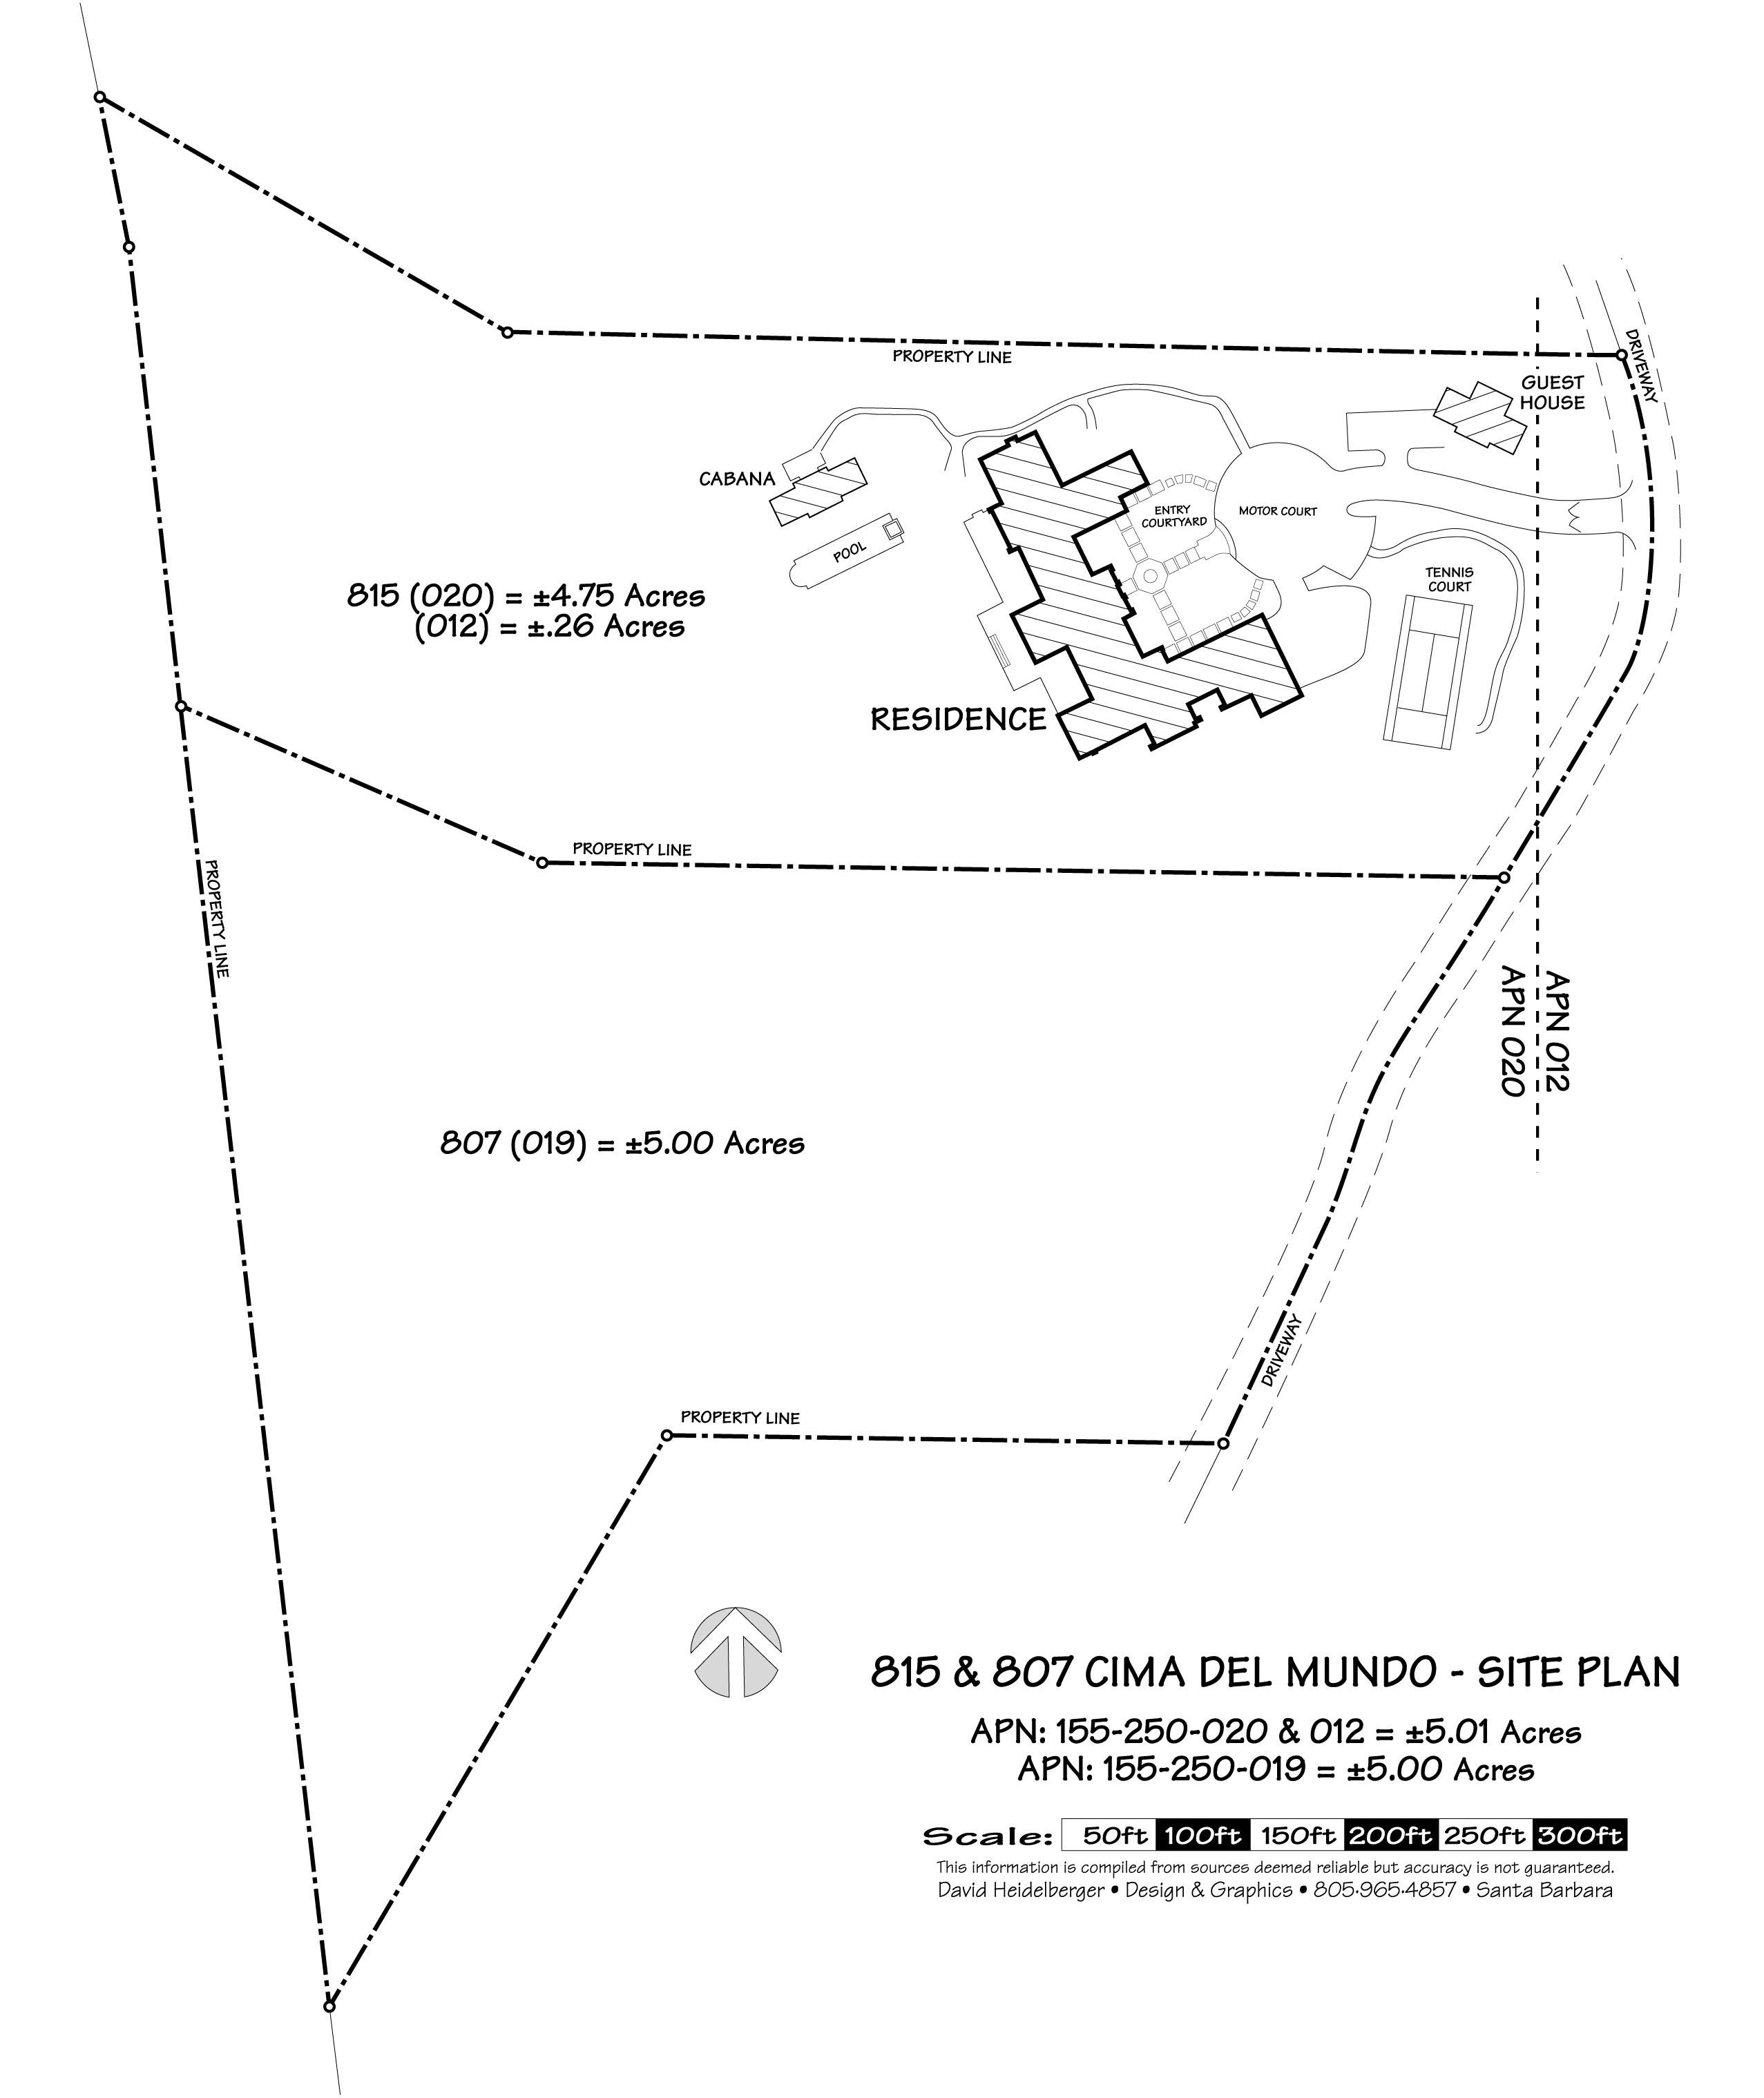 815 Cima del Mundo Site Plans